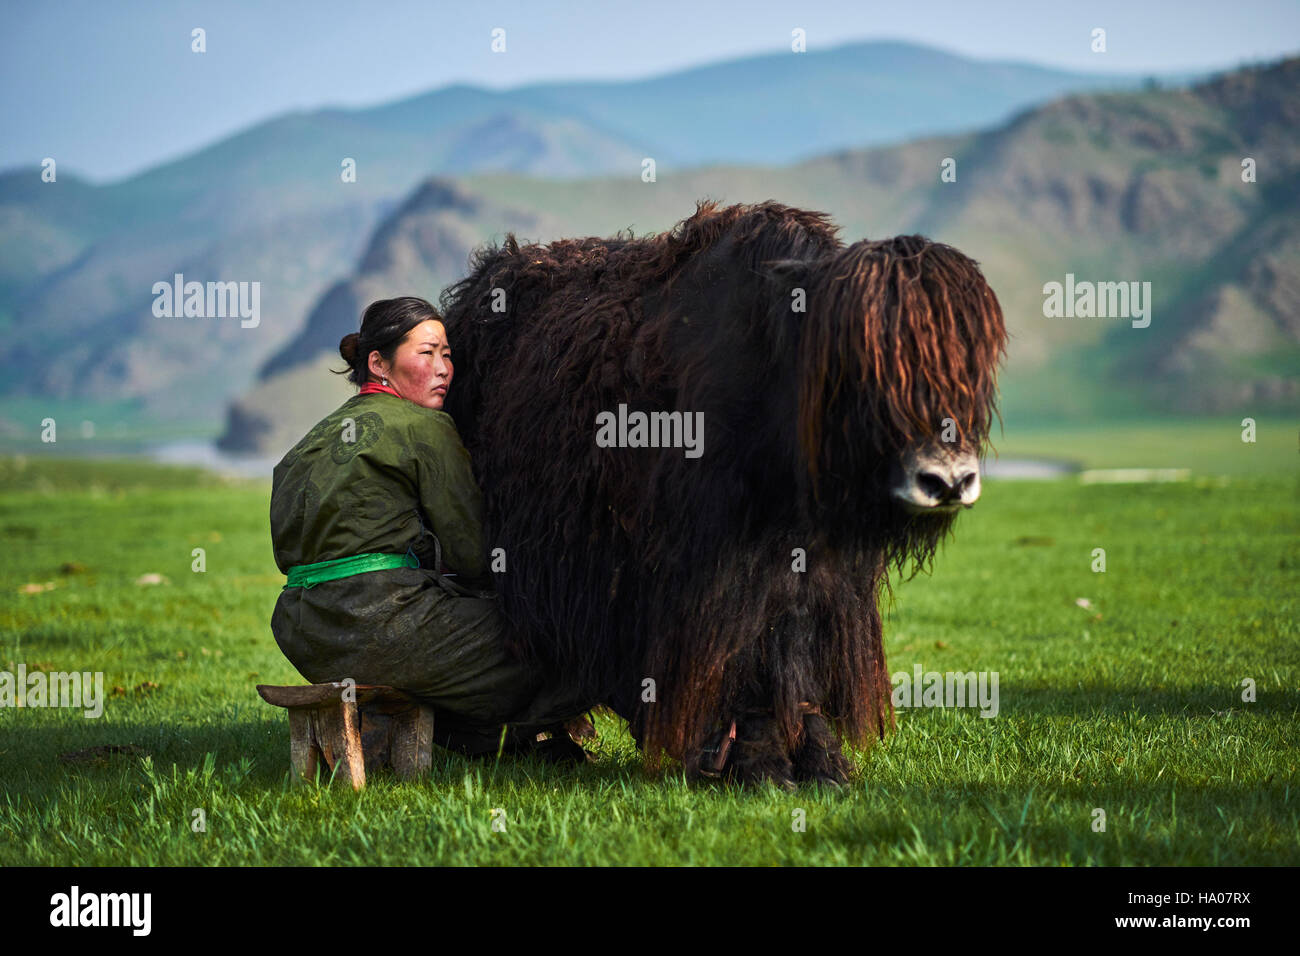 Mongolia, Ovorkhangai province, Orkhon valley, Nomad camp, yak milking - Stock Image